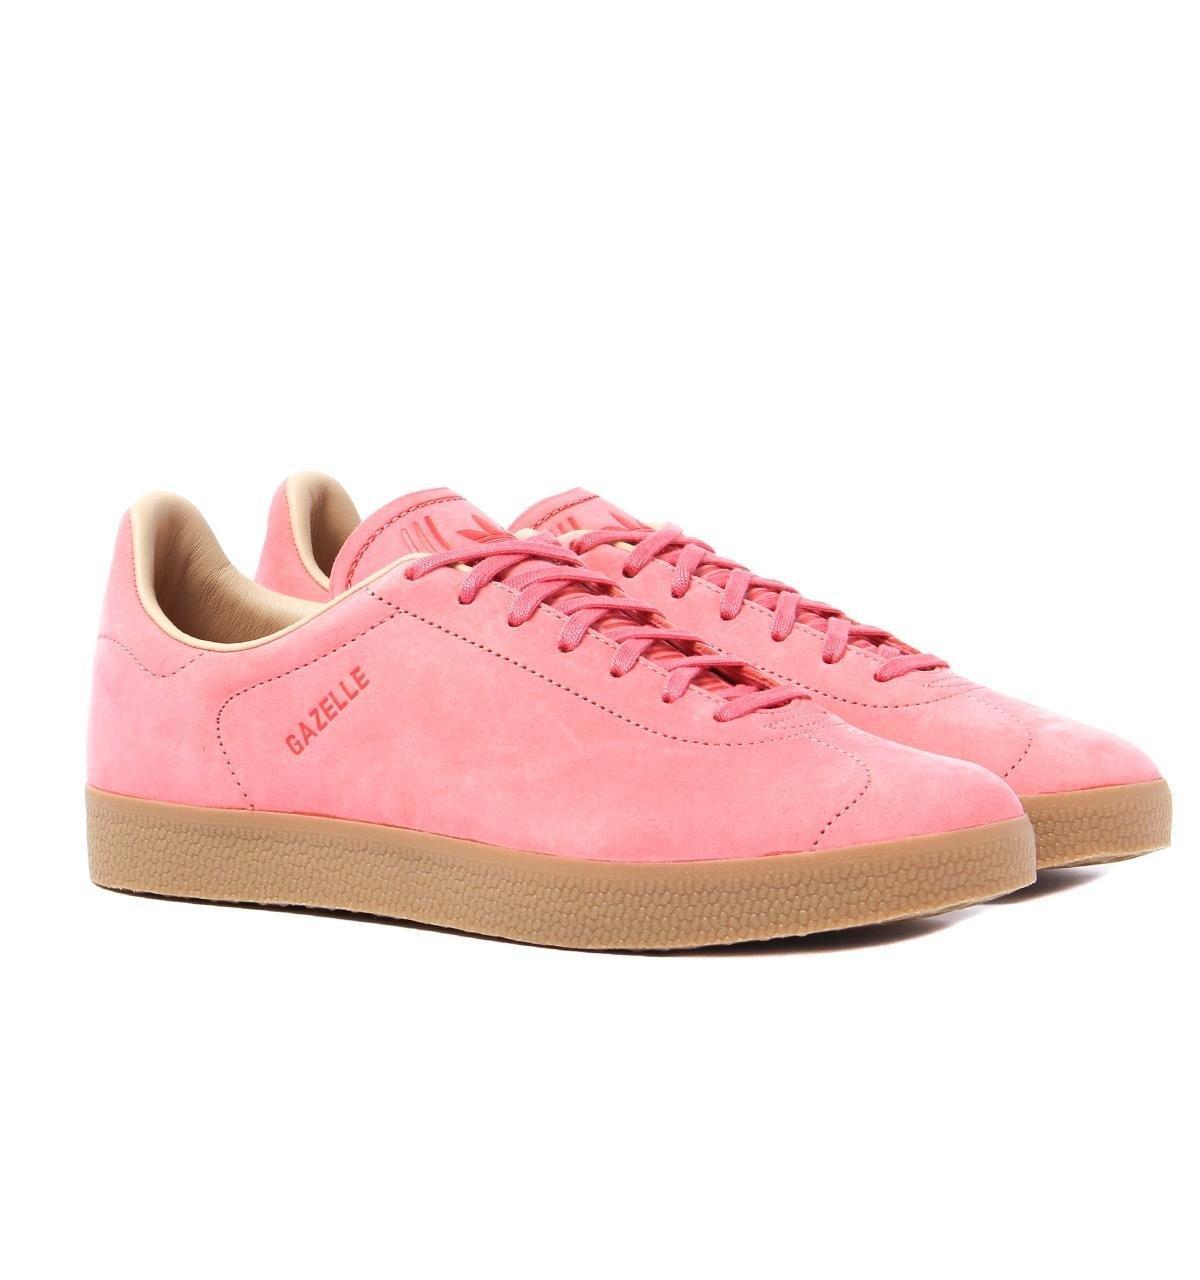 ec7104af55b7 adidas Originals Gazelle Decon Tactile Rose Pink Trainers in Pink - Lyst